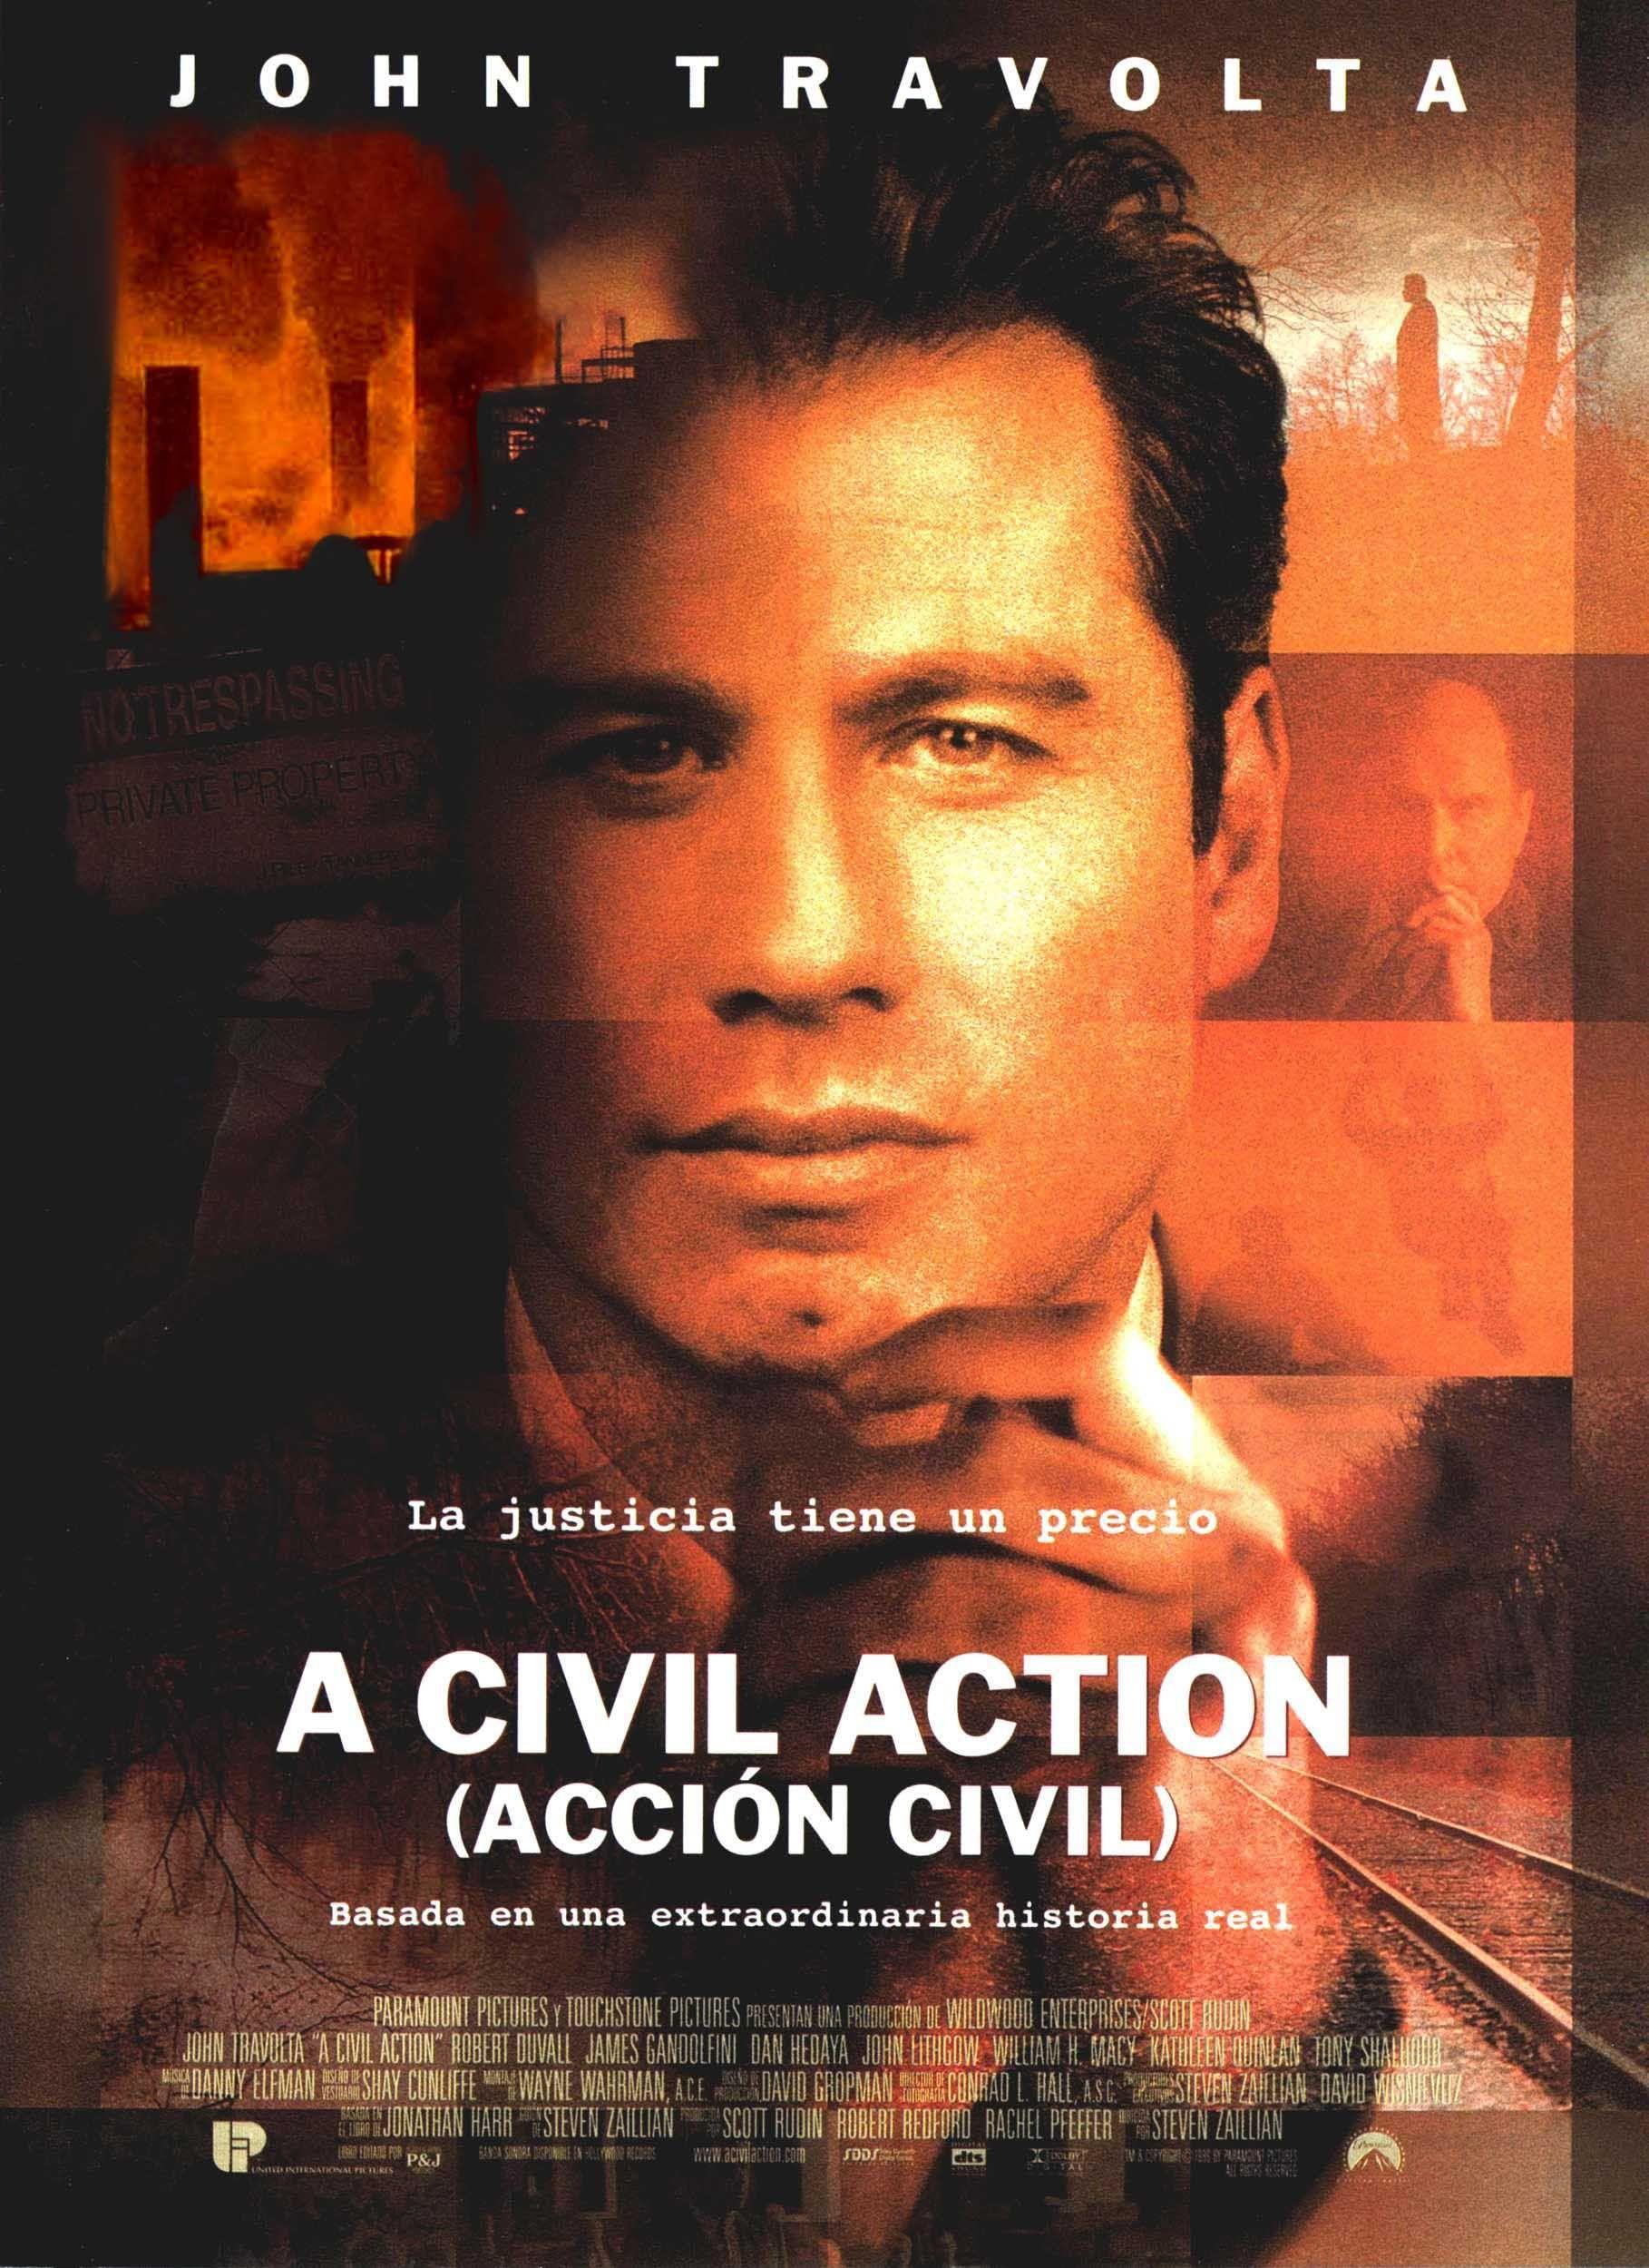 Accion Civil Action Movie Poster John Travolta Robert Duvall